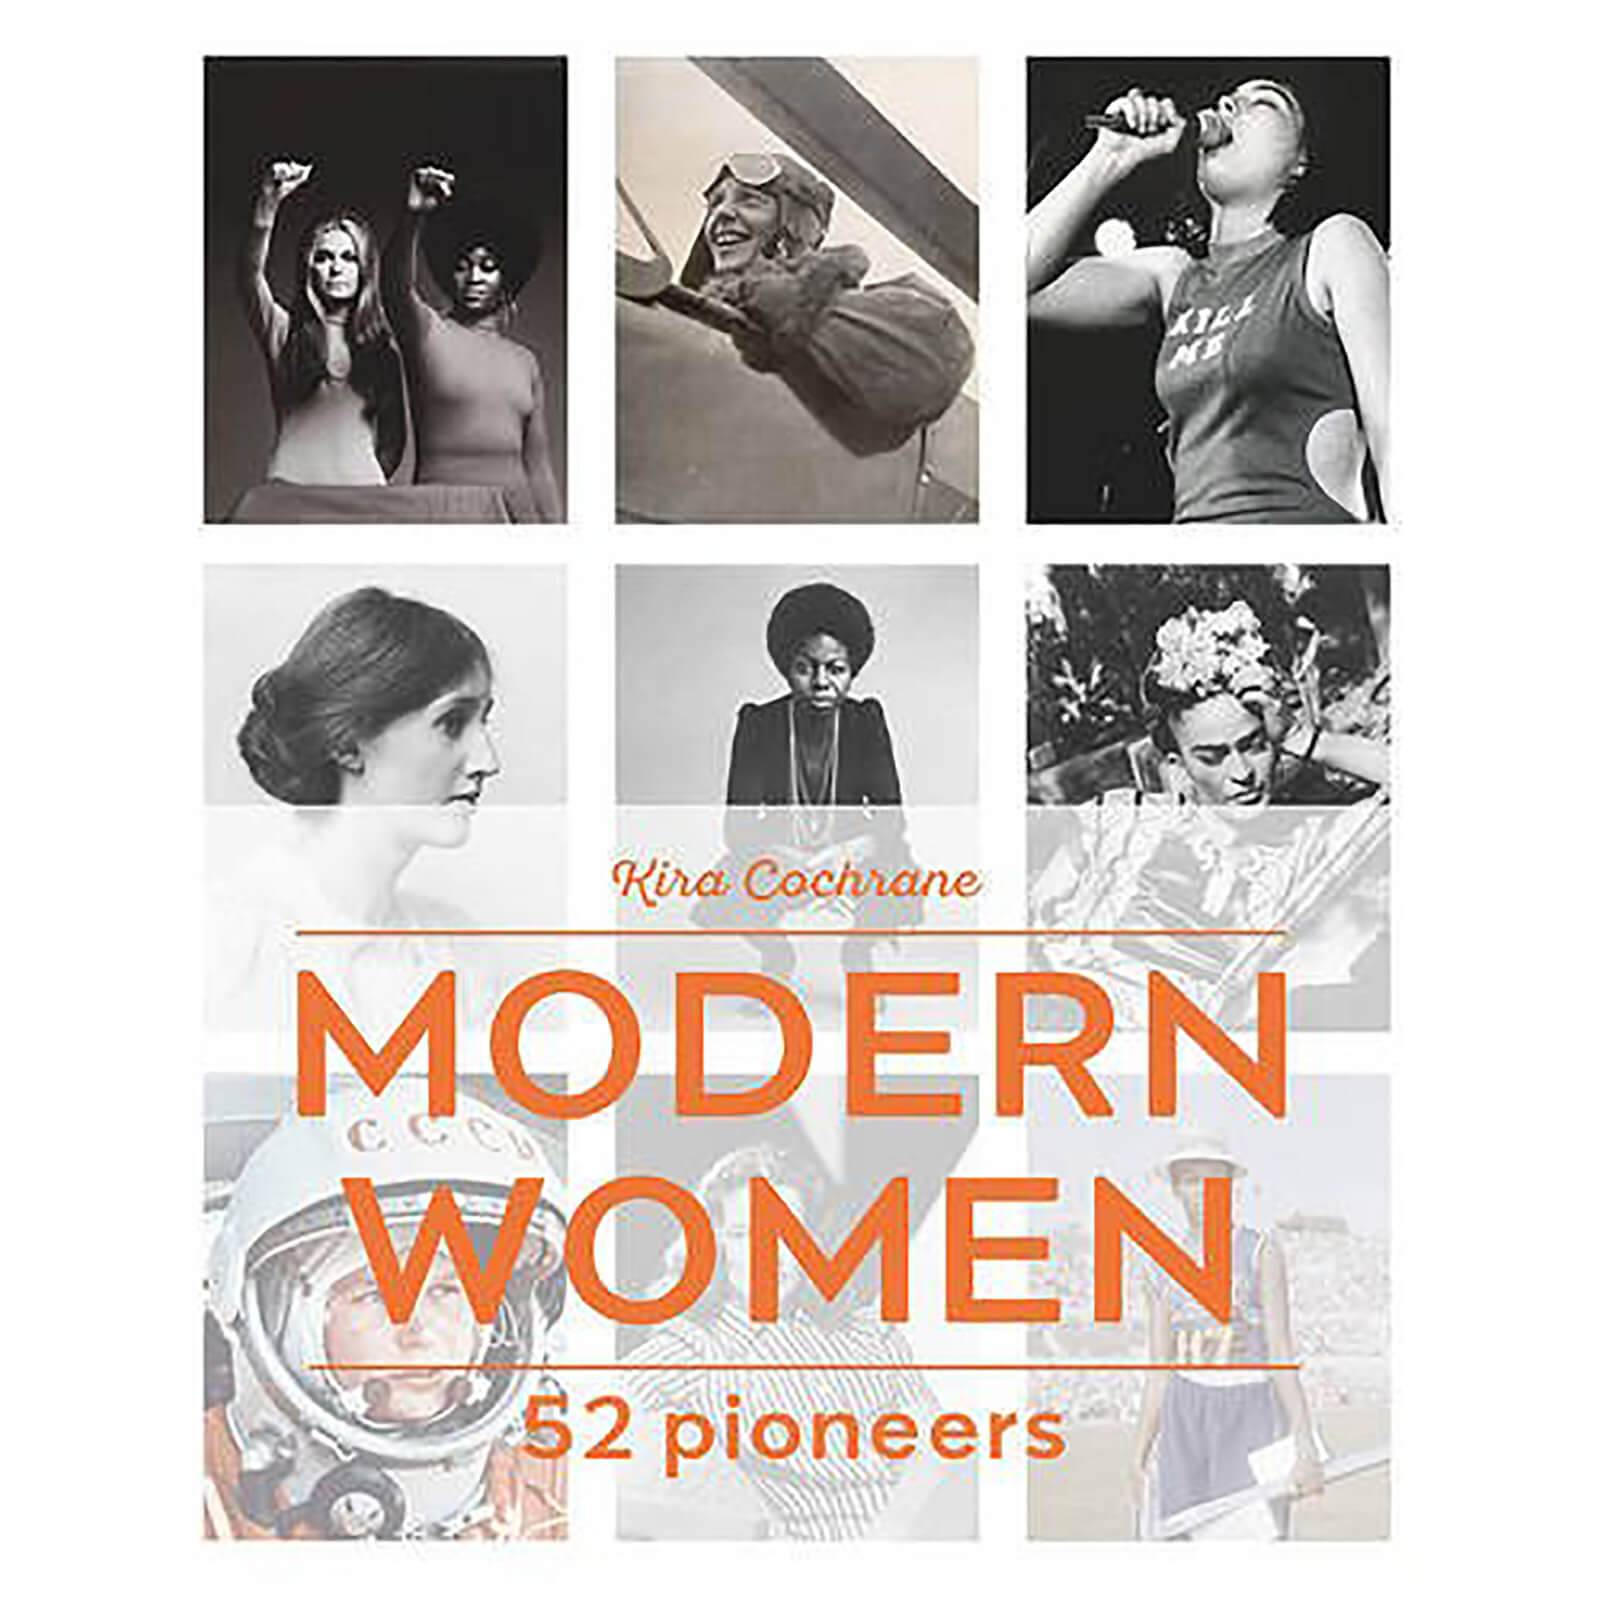 Bookspeed: Modern Women: 52 Pioneers